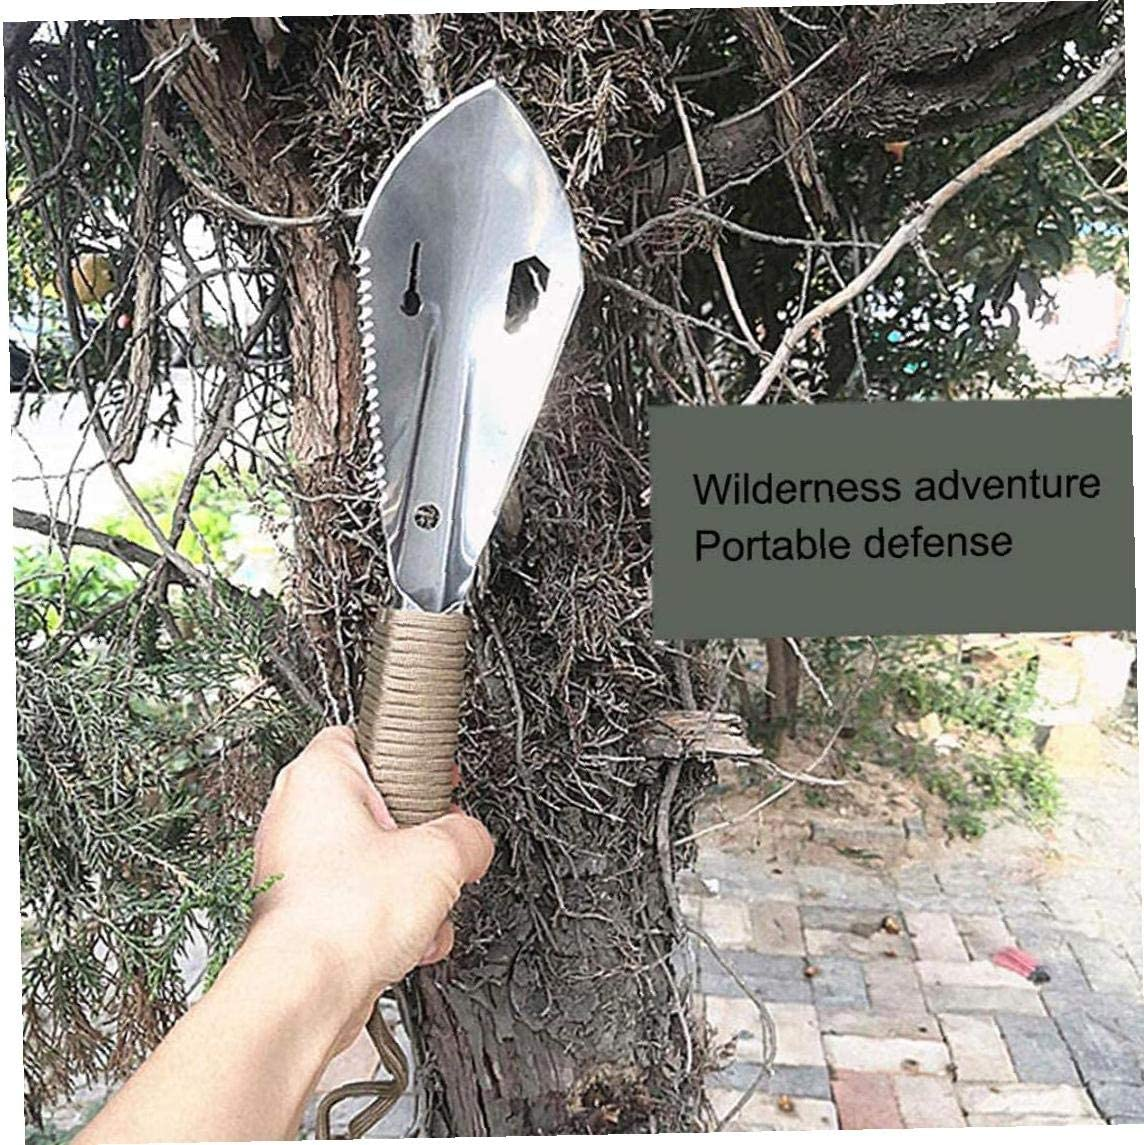 Mini Garden Spade Digging Tool Hand Trowel Spade Stainless Steel Portable for Gardening Farming Camping Black Gardening Trowels